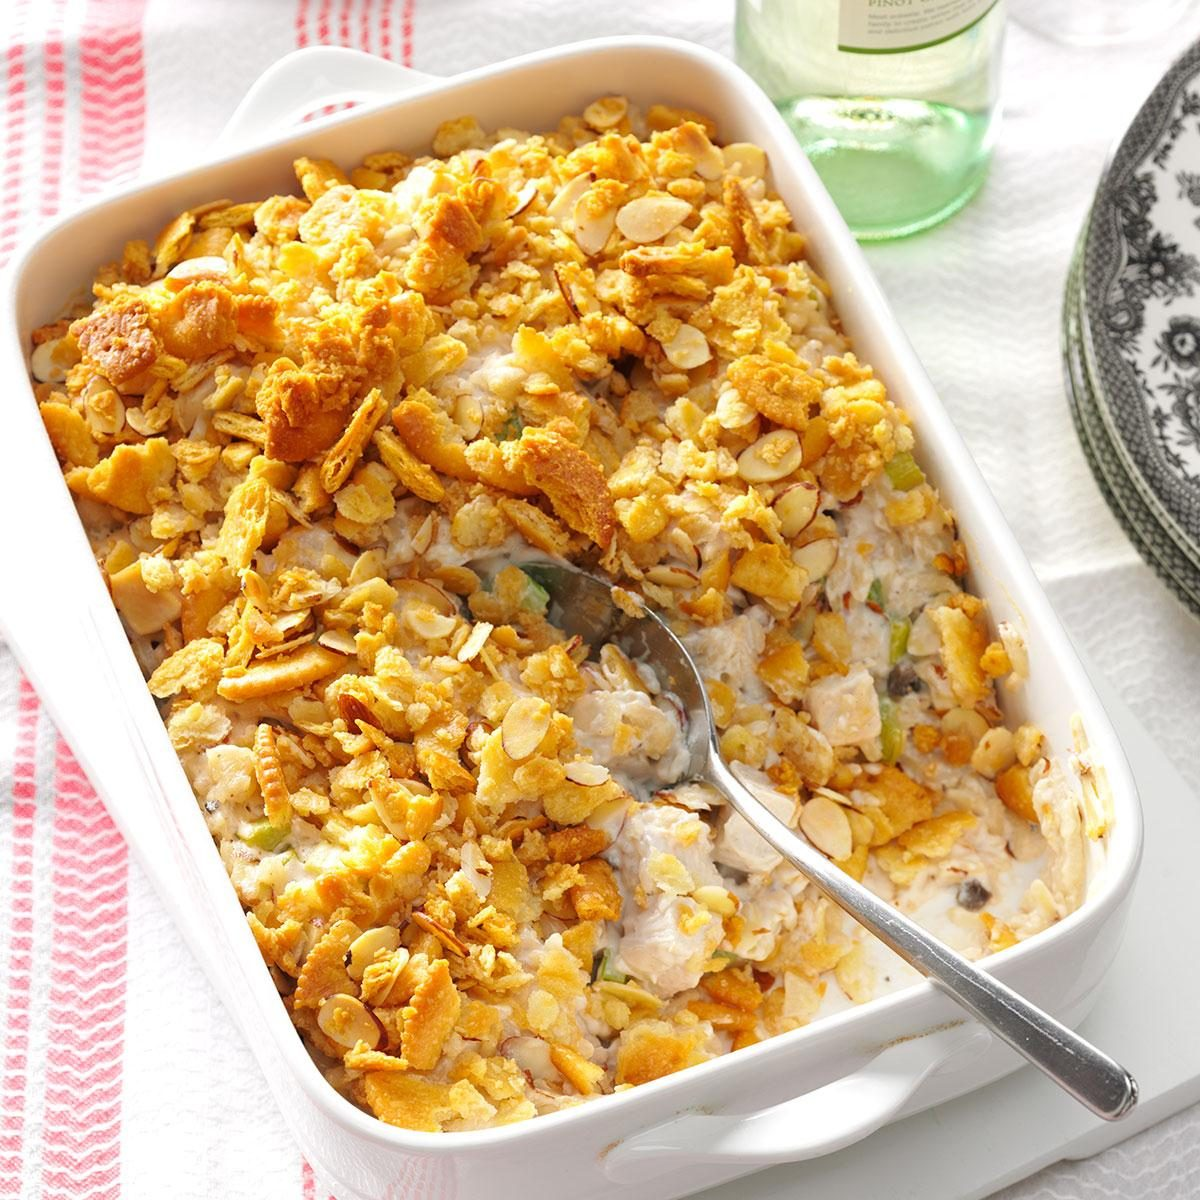 Crunchy Almond Turkey Casserole Recipe